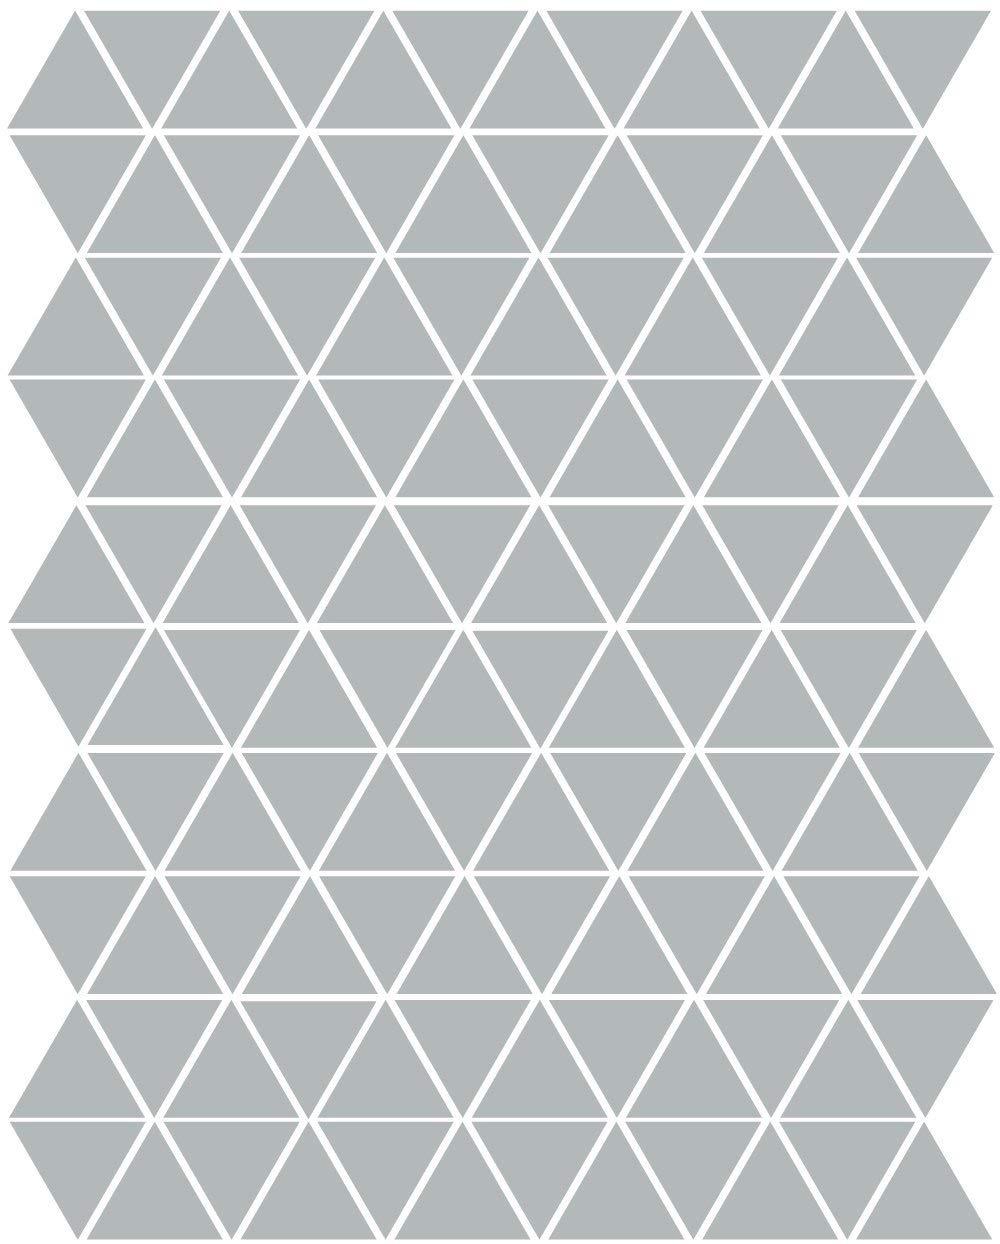 Triangle Wall Stickers Vinyl Wall Decals 120 Mini Triangle Wall Decals in Gold Silver or Color Vinyl